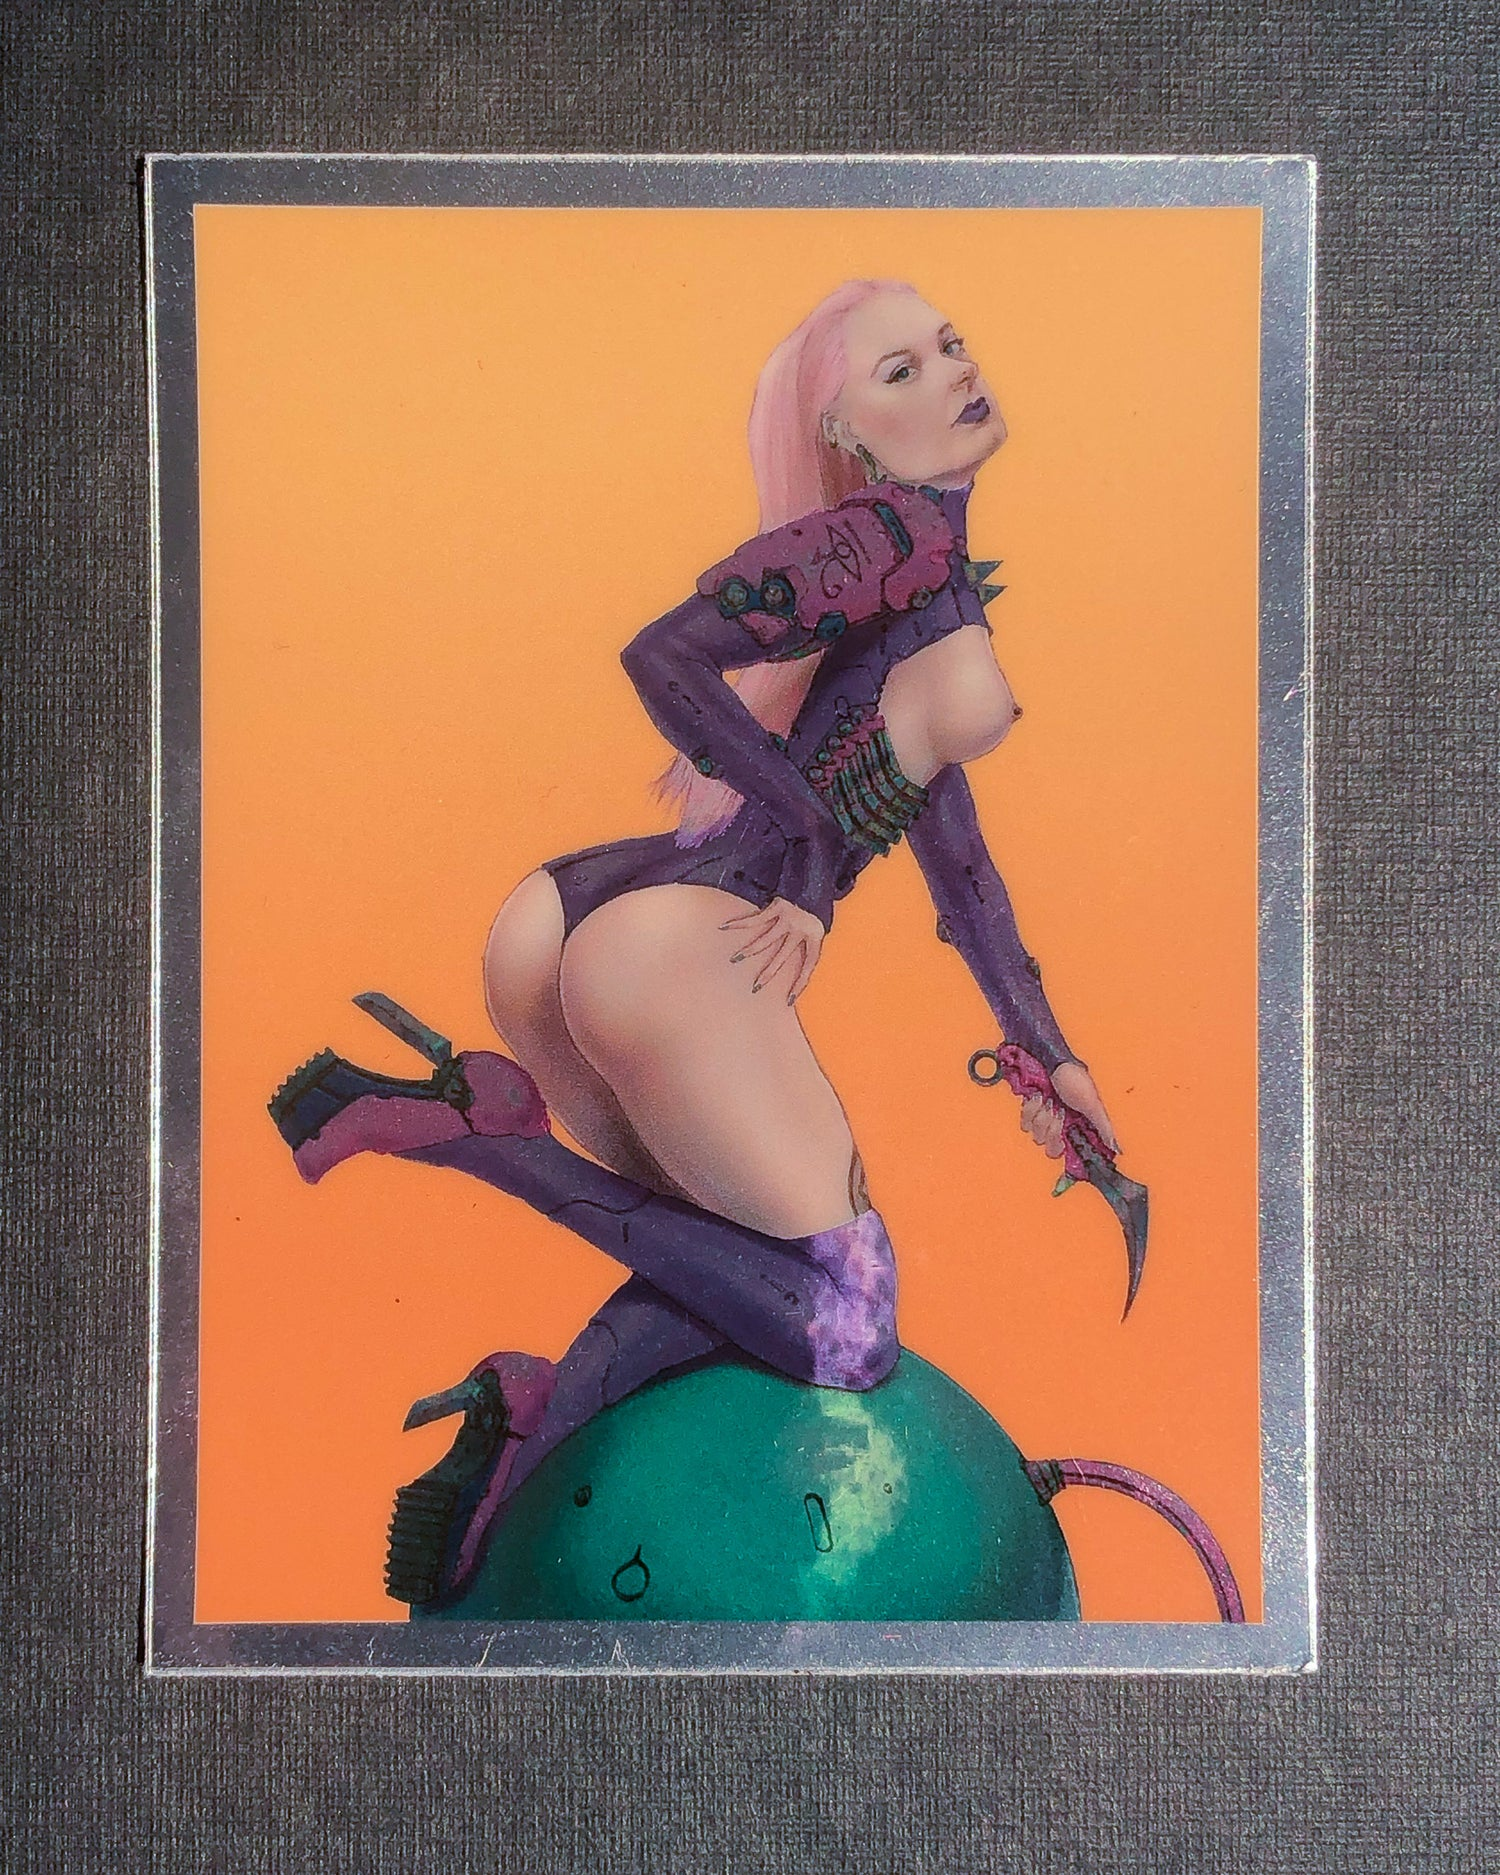 Cyberpunk chrome sticker